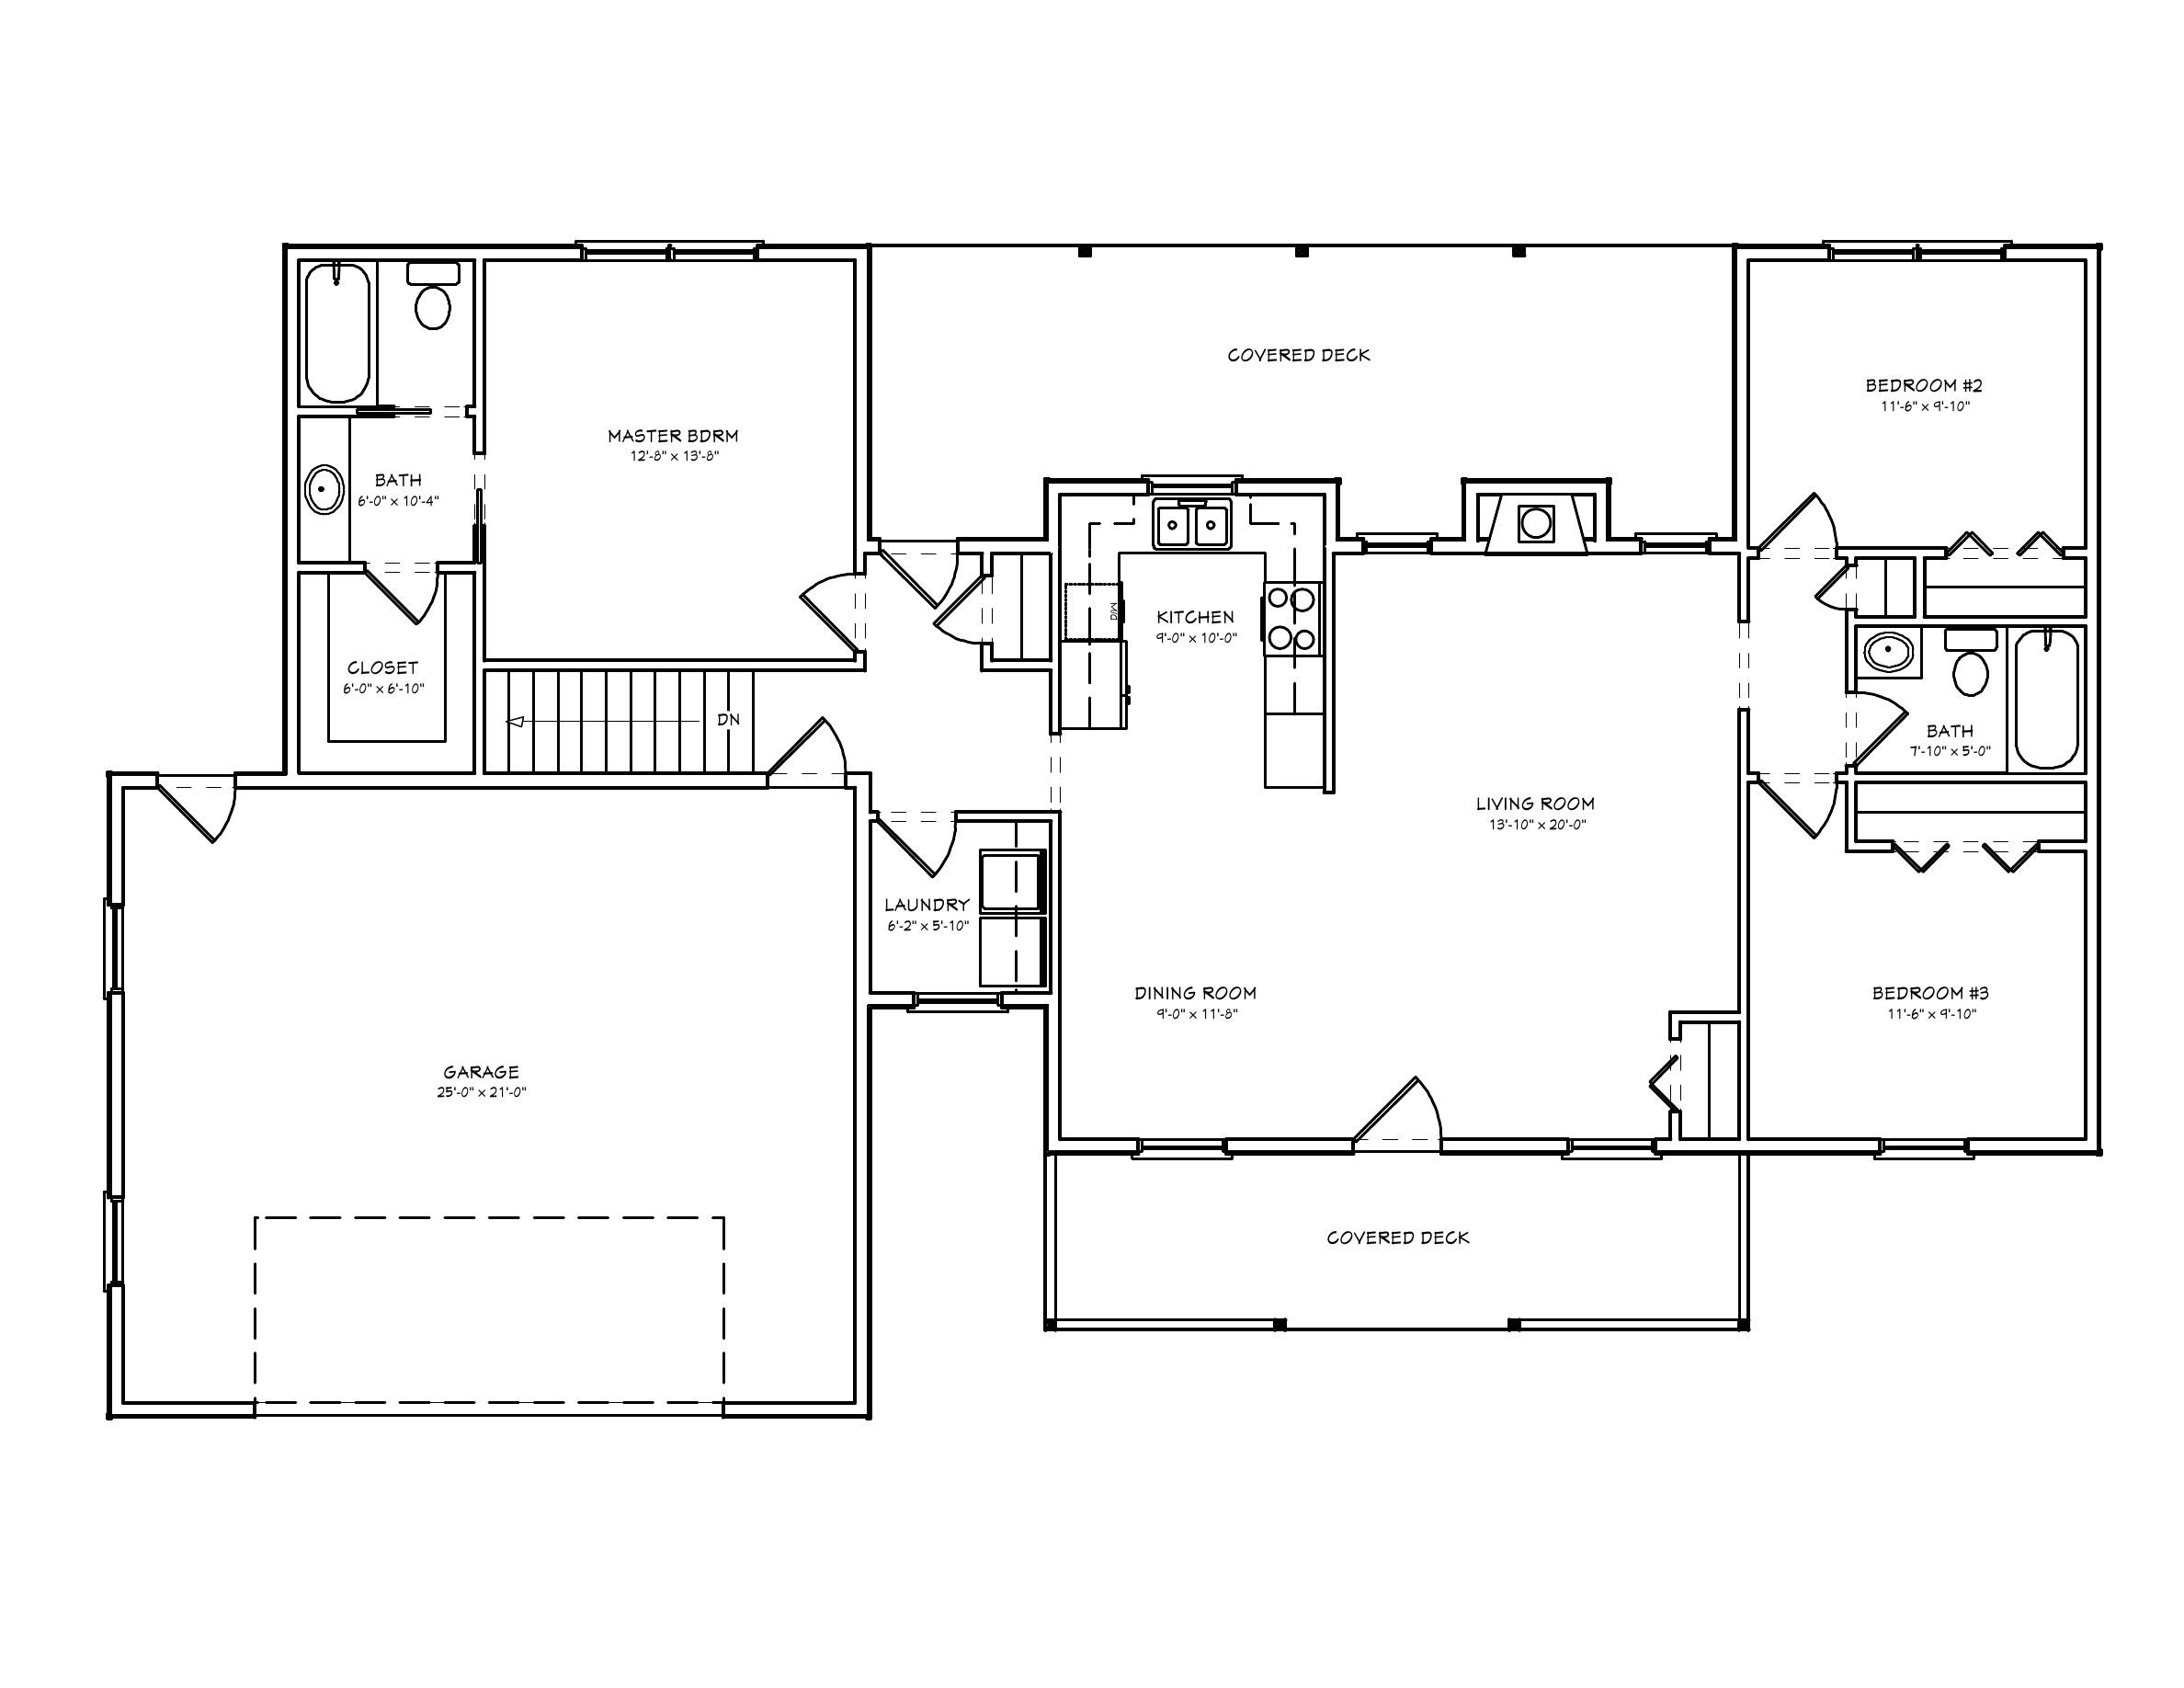 bedroom image of design ideas ranch floor plans with split and smart bedrooms